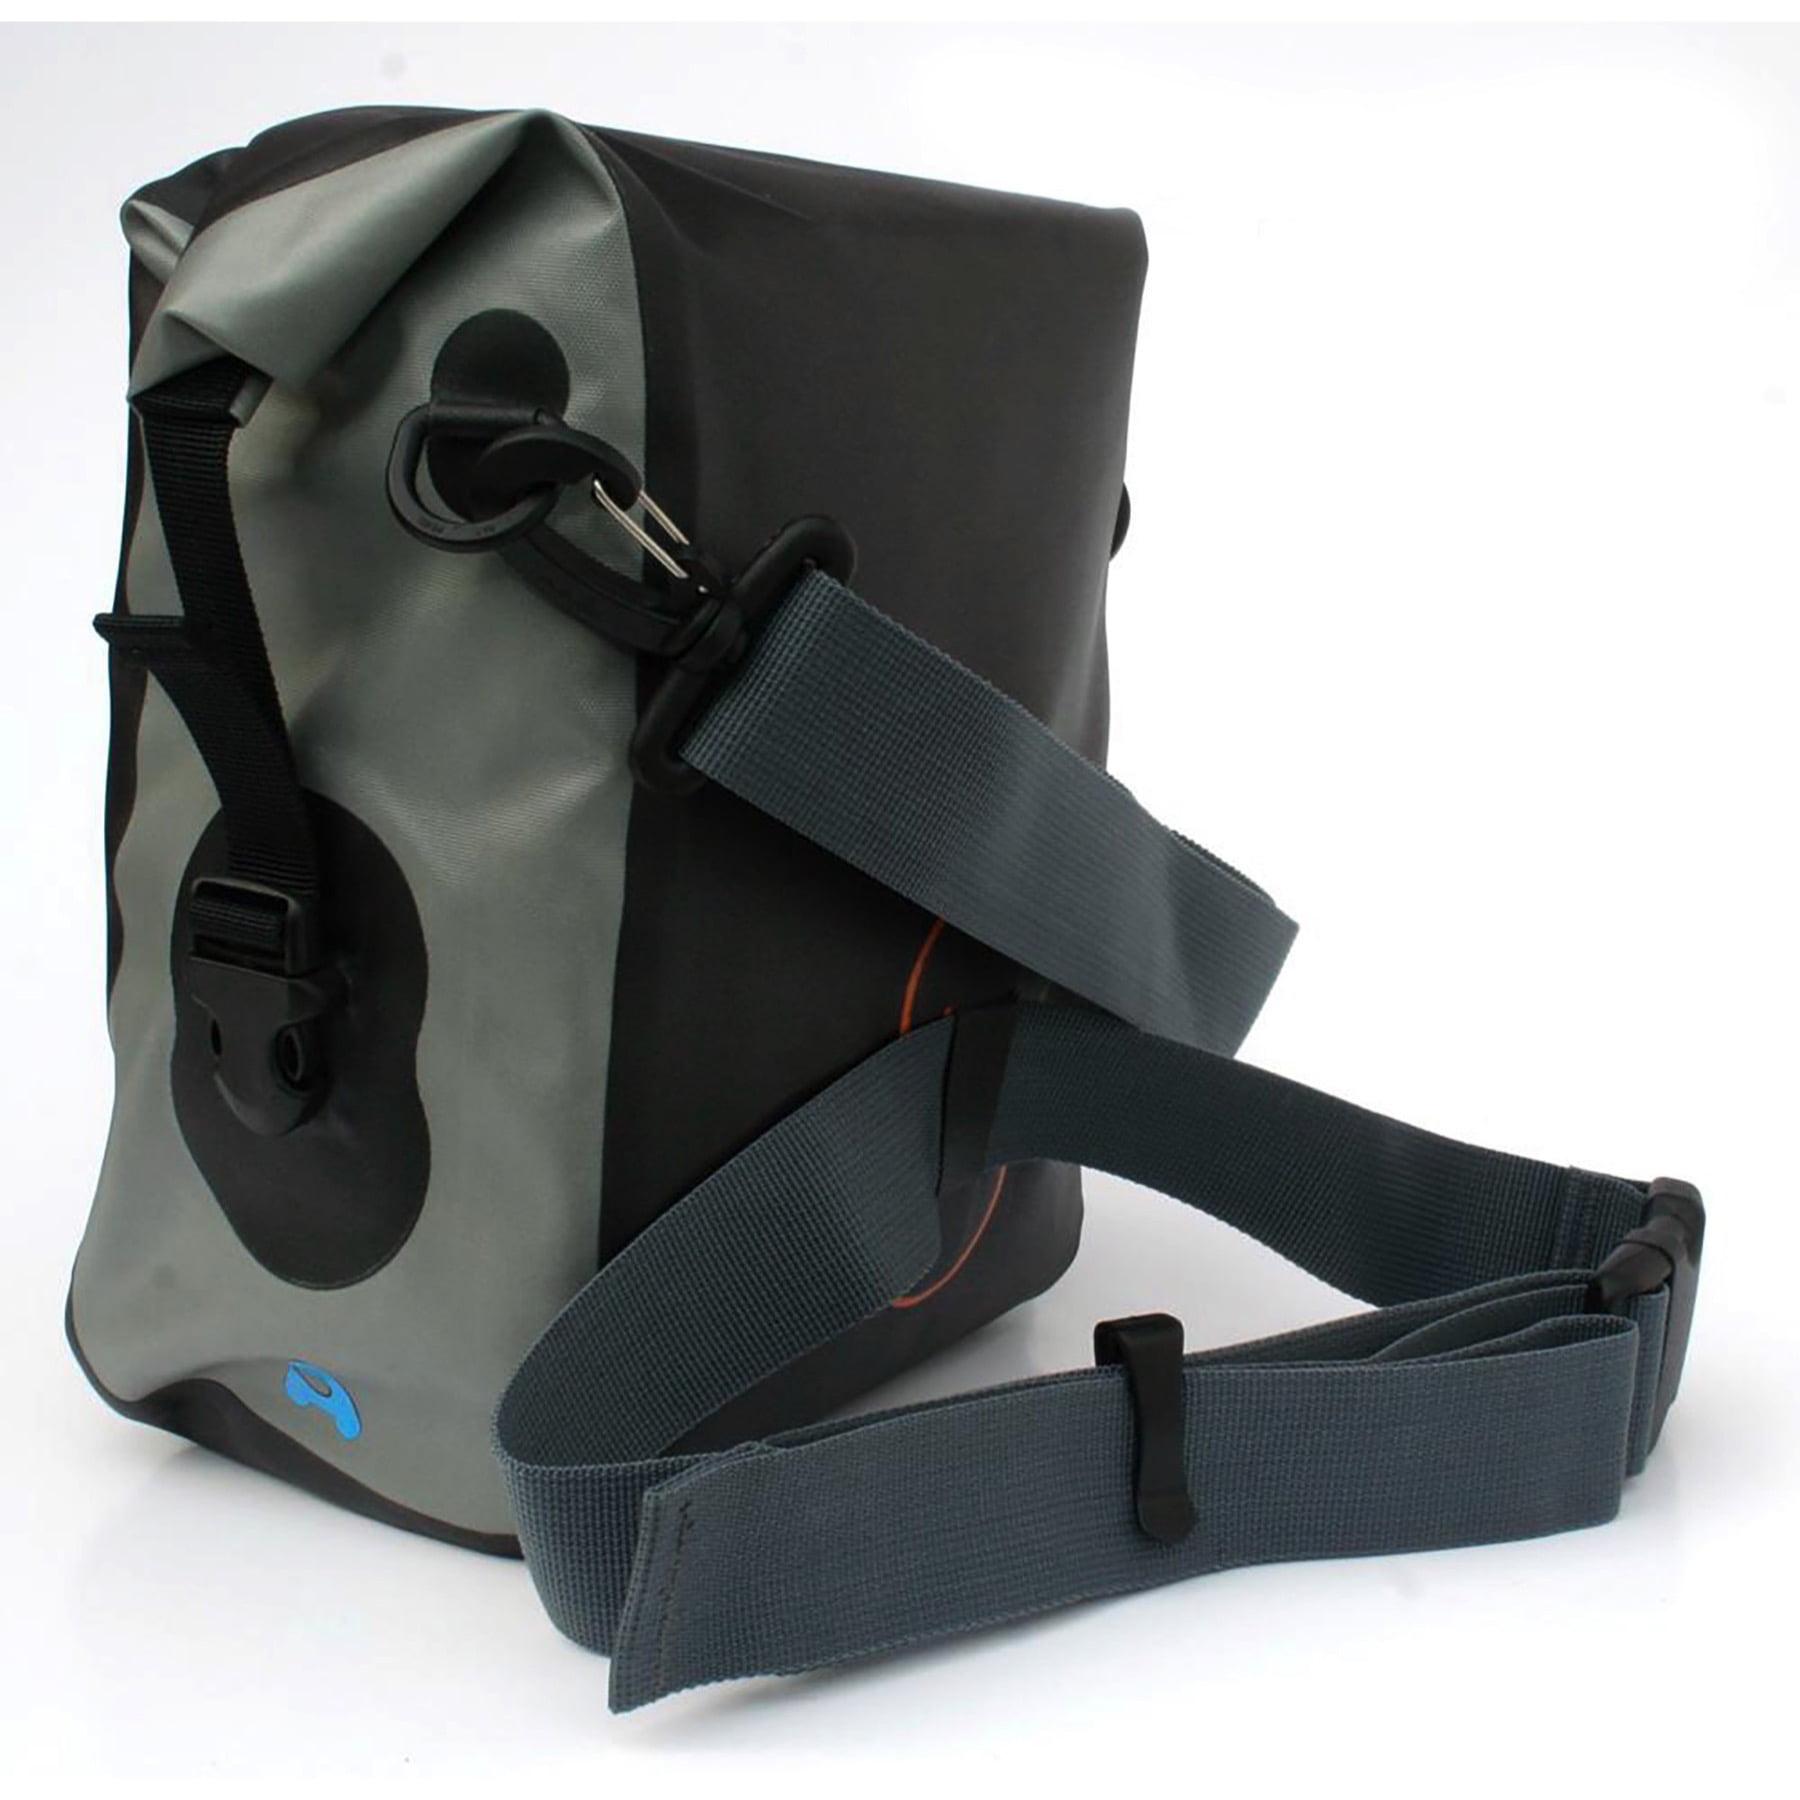 Aquapac Stormproof DSLR Camera Pouch Waterproof Padded Ca...